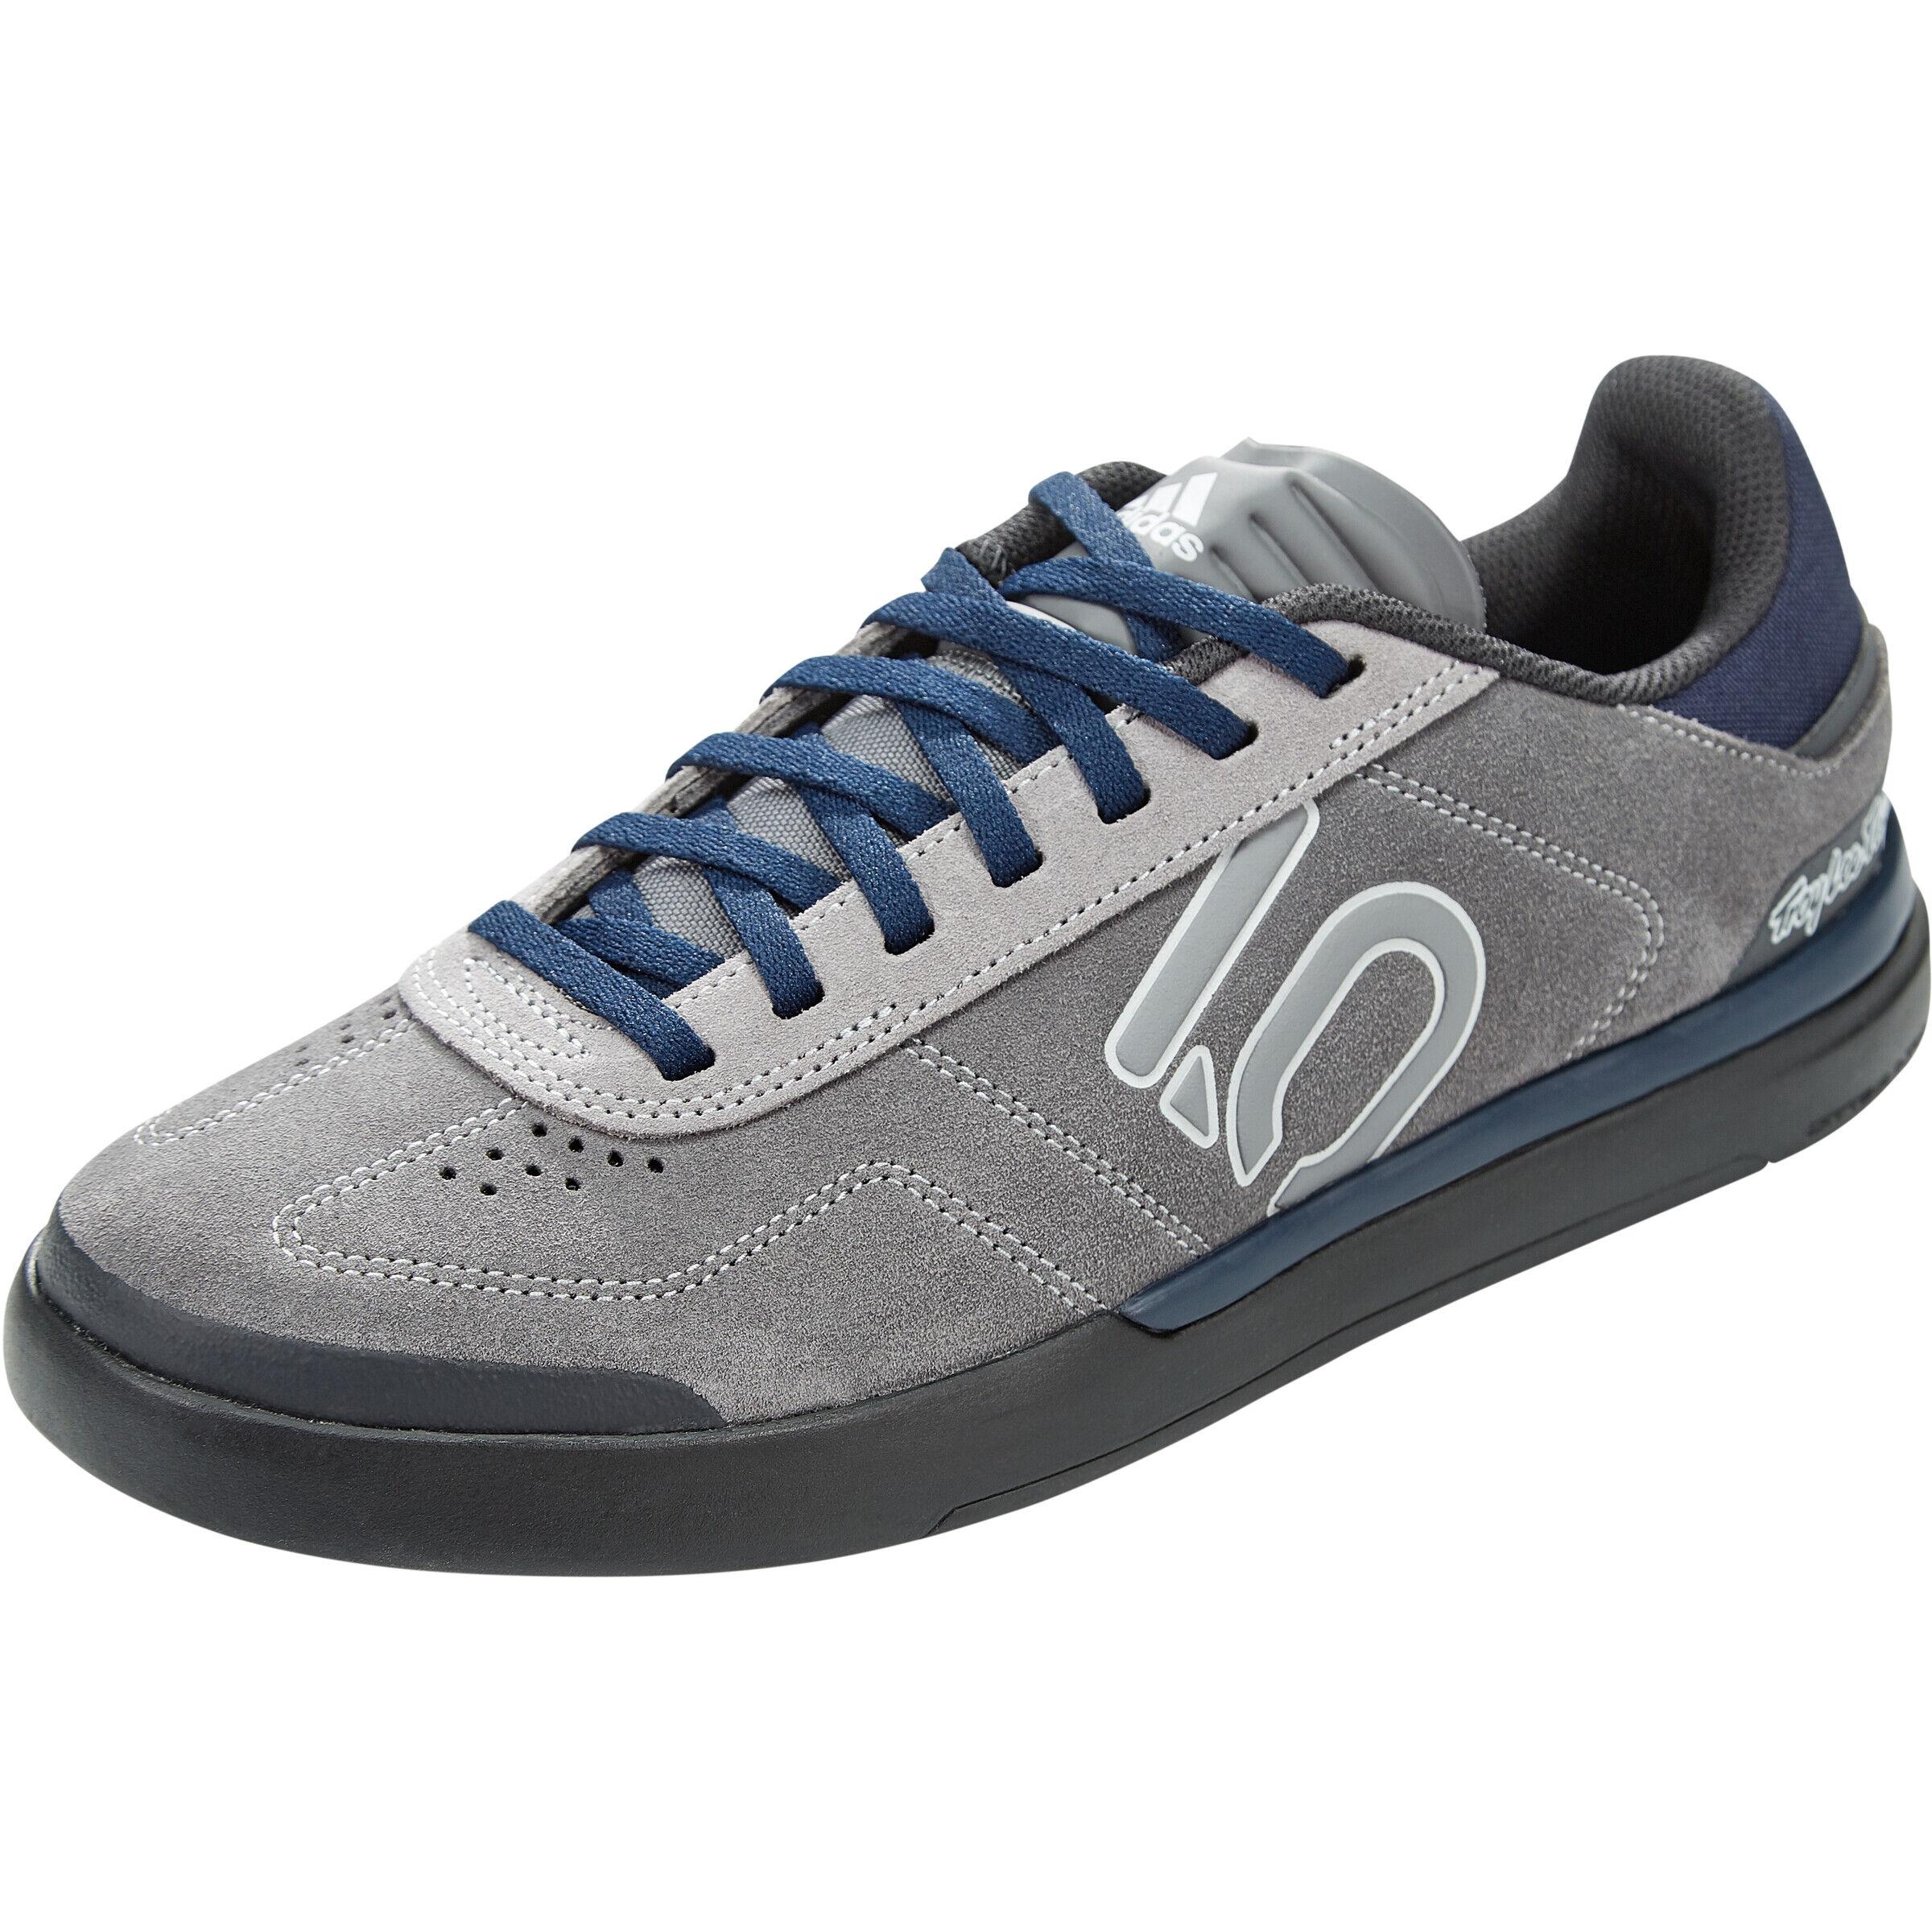 adidas Five Ten Sleuth DLX TLD Low Cut Schuhe Herren grey threeclear greycollegiate navy